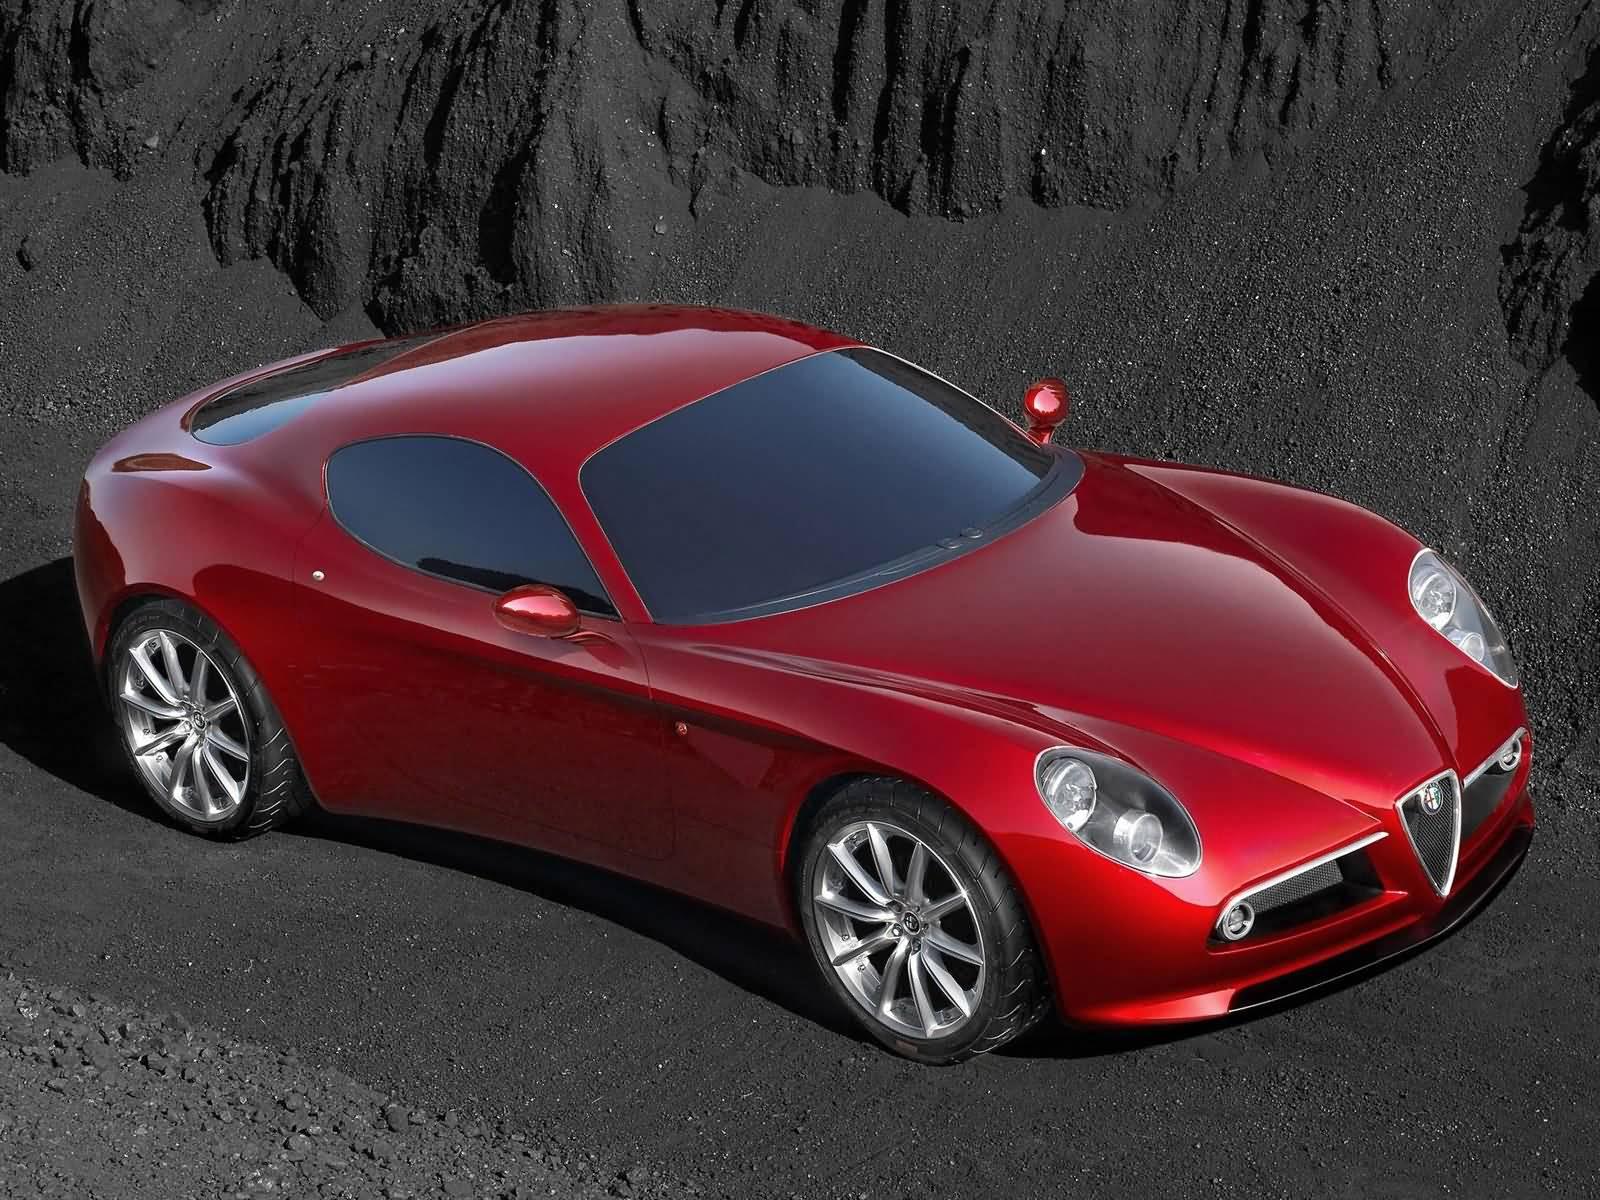 33 Alfa Romeo HD Wallpaper , 4K Wallpaper, Full HD Wallpaper